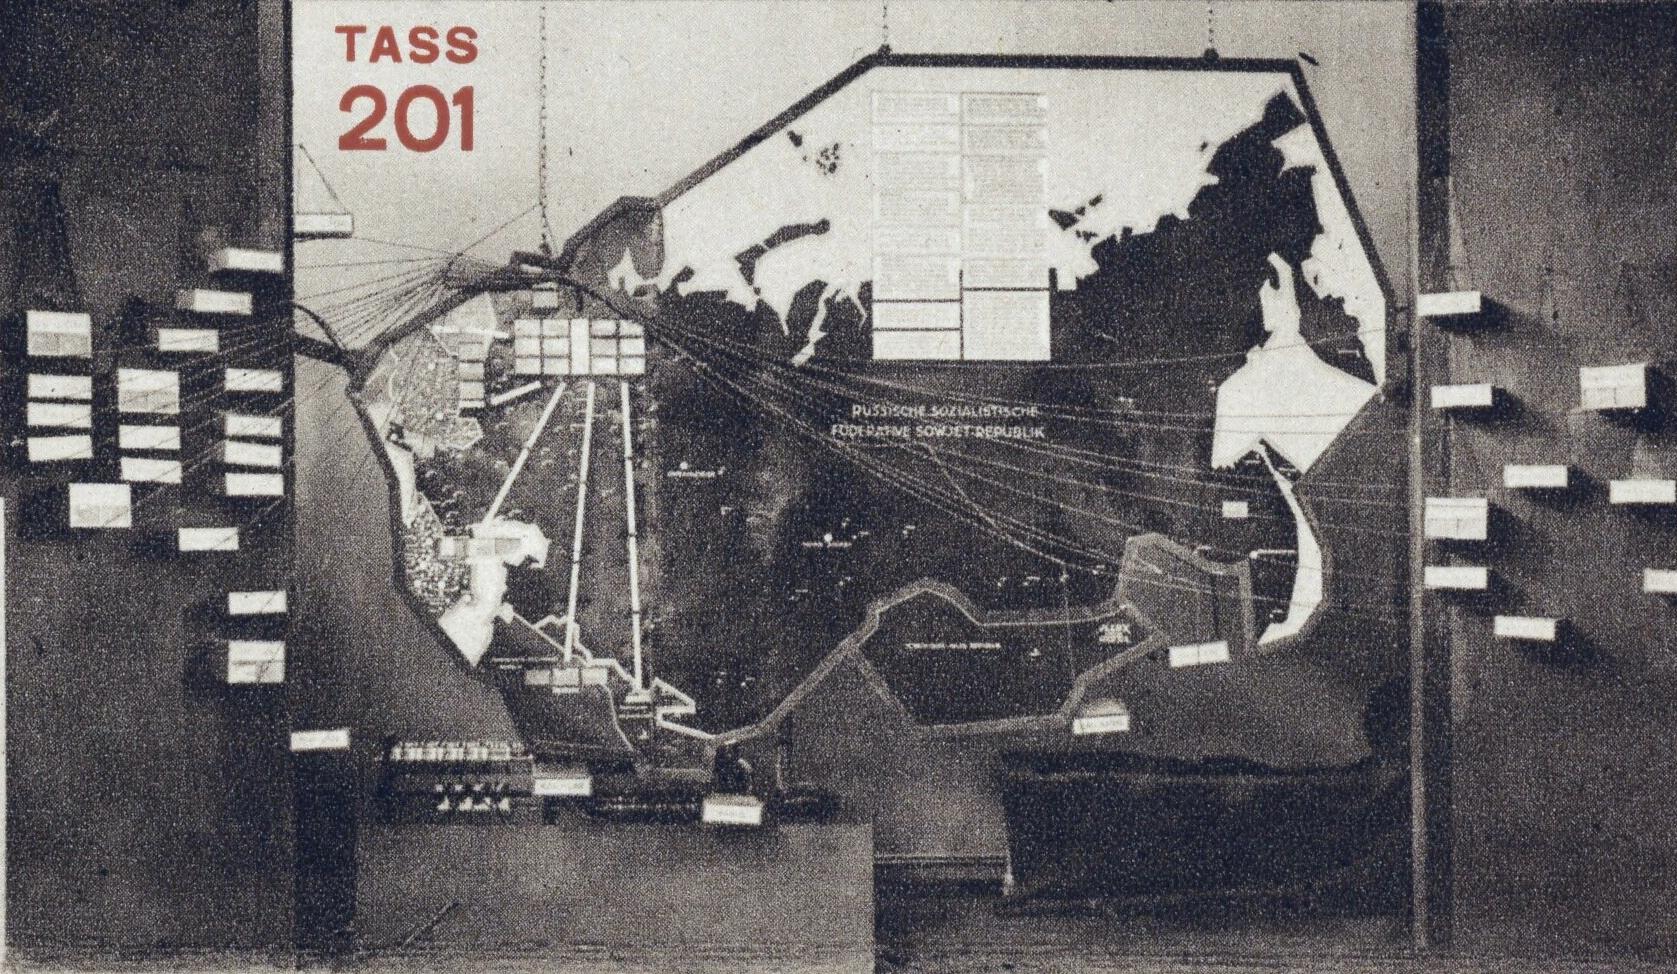 Katalog des Sowjet-Pavillons auf der Internationalen Presse-Ausstellung Köln 1928, pgs 18-20c1